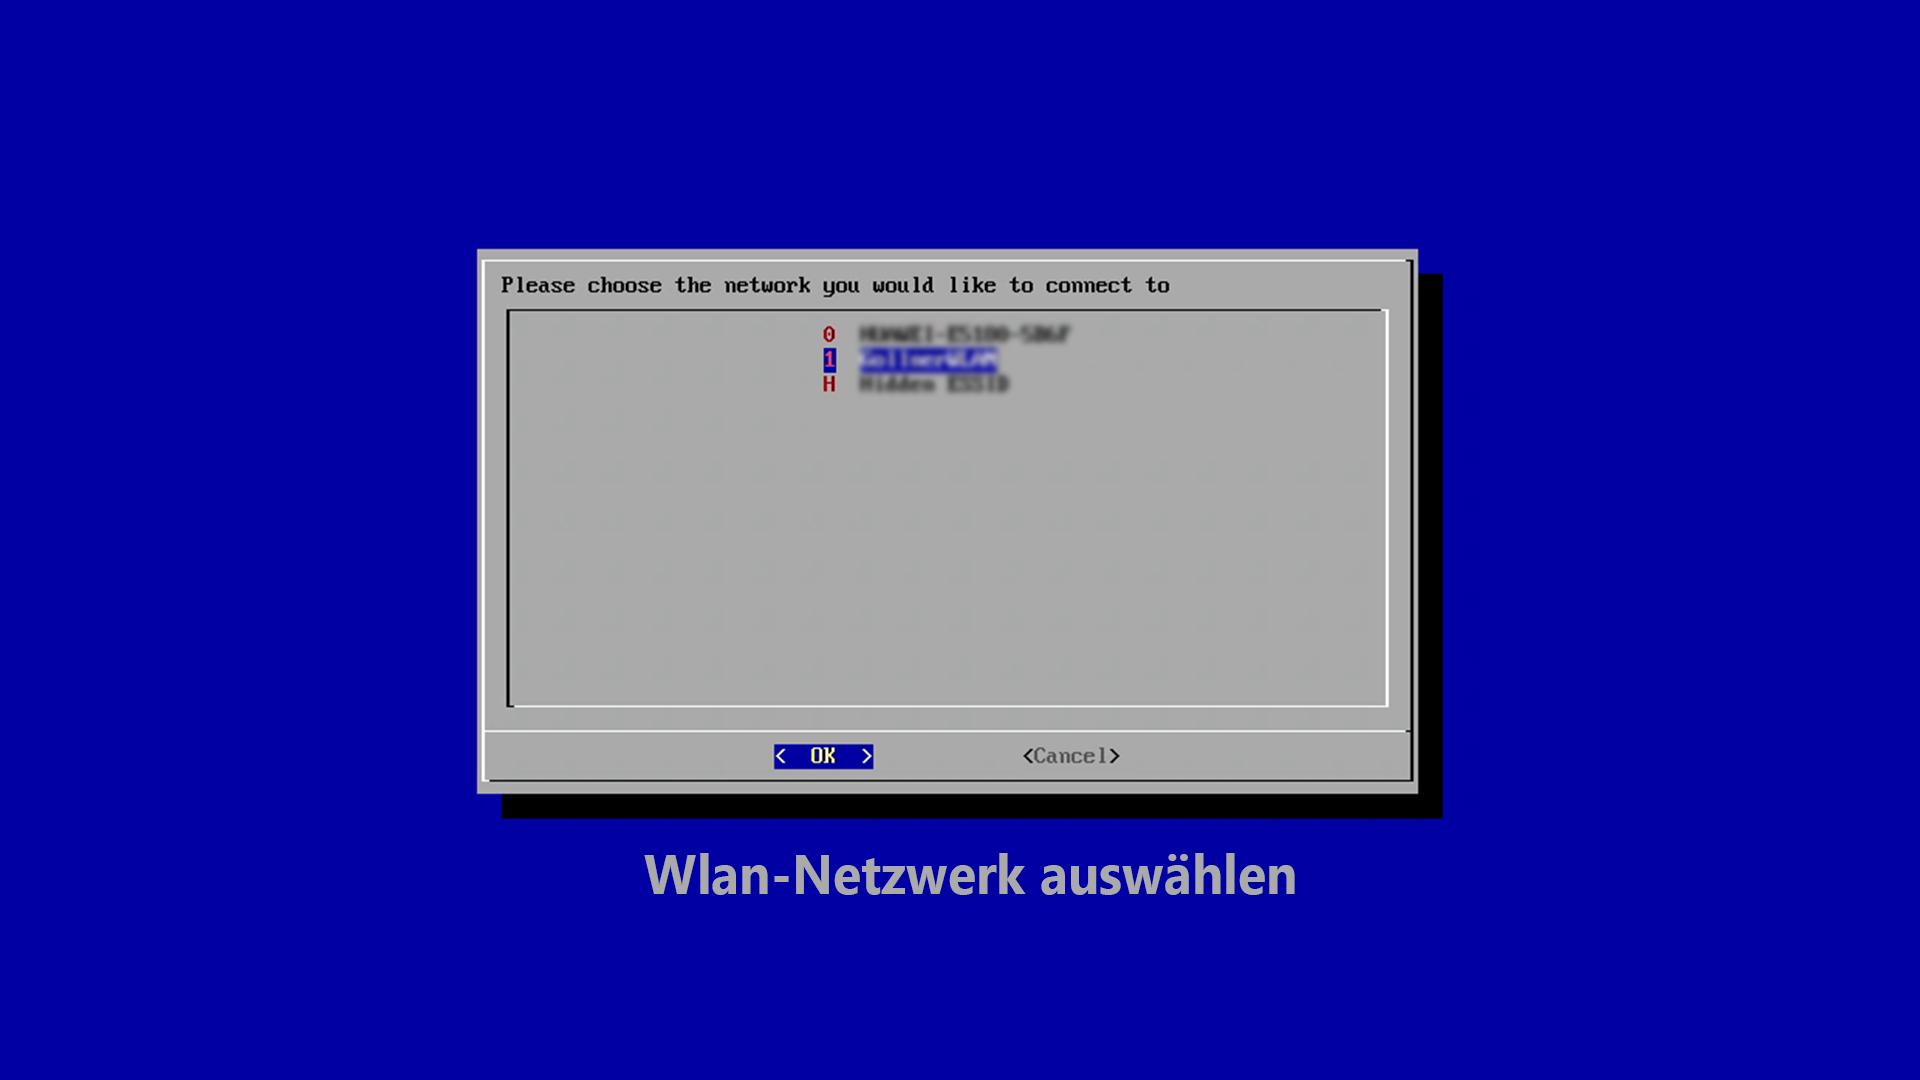 DigitaleWelt RetroPie Anleitung - Wlan-Netzwerk auswählen